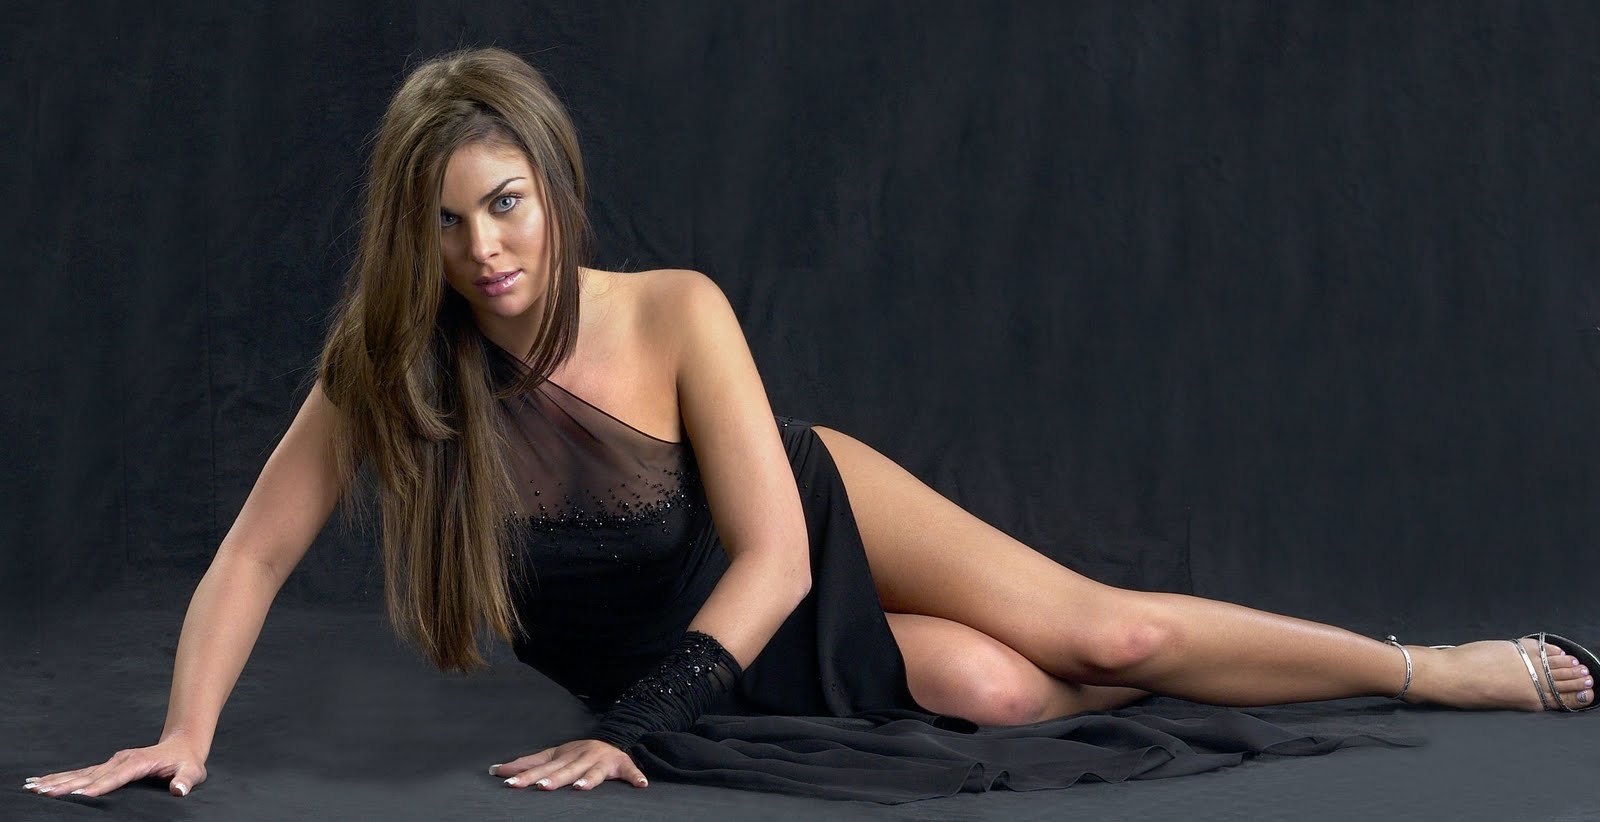 Nadja bjorlin nude — photo 3